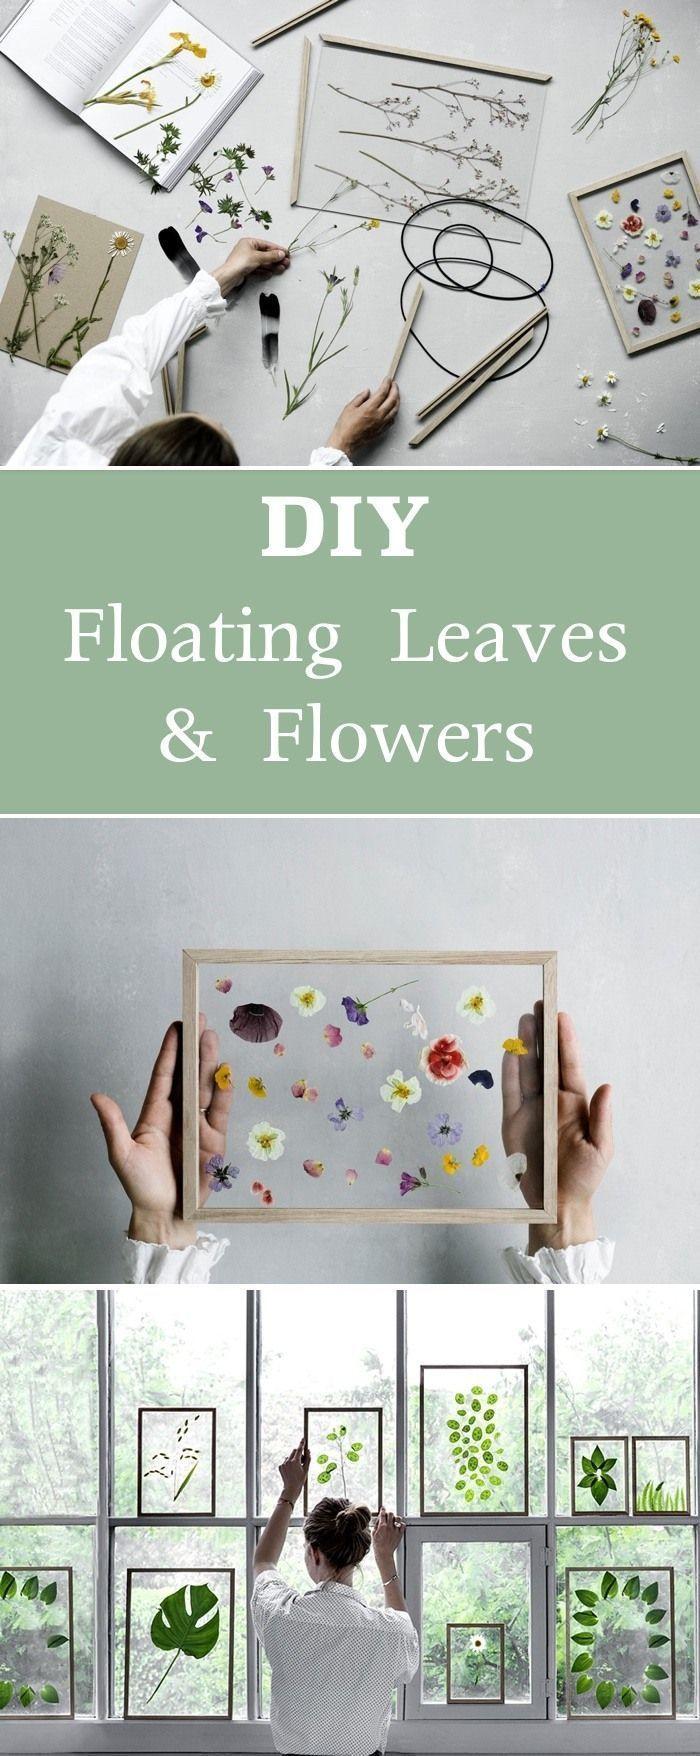 26 Easy DIY Home Decor Craft Projects  Getrocknete blumen, Deko